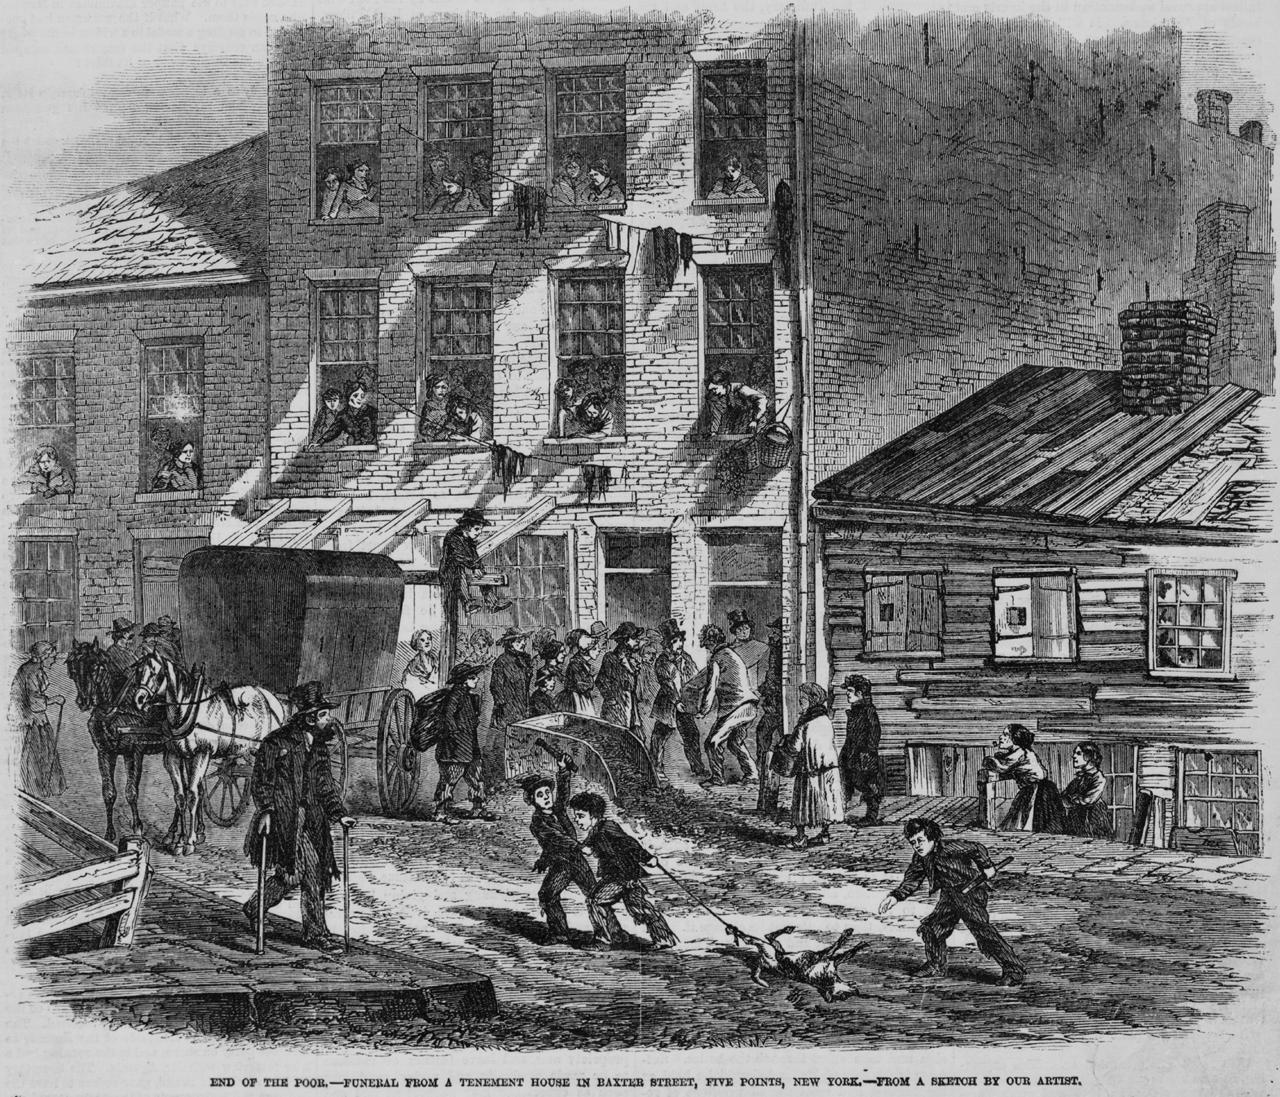 Tenement House 1865 (via http://www.loc.gov/pictures/resource/cph.3c21734/)